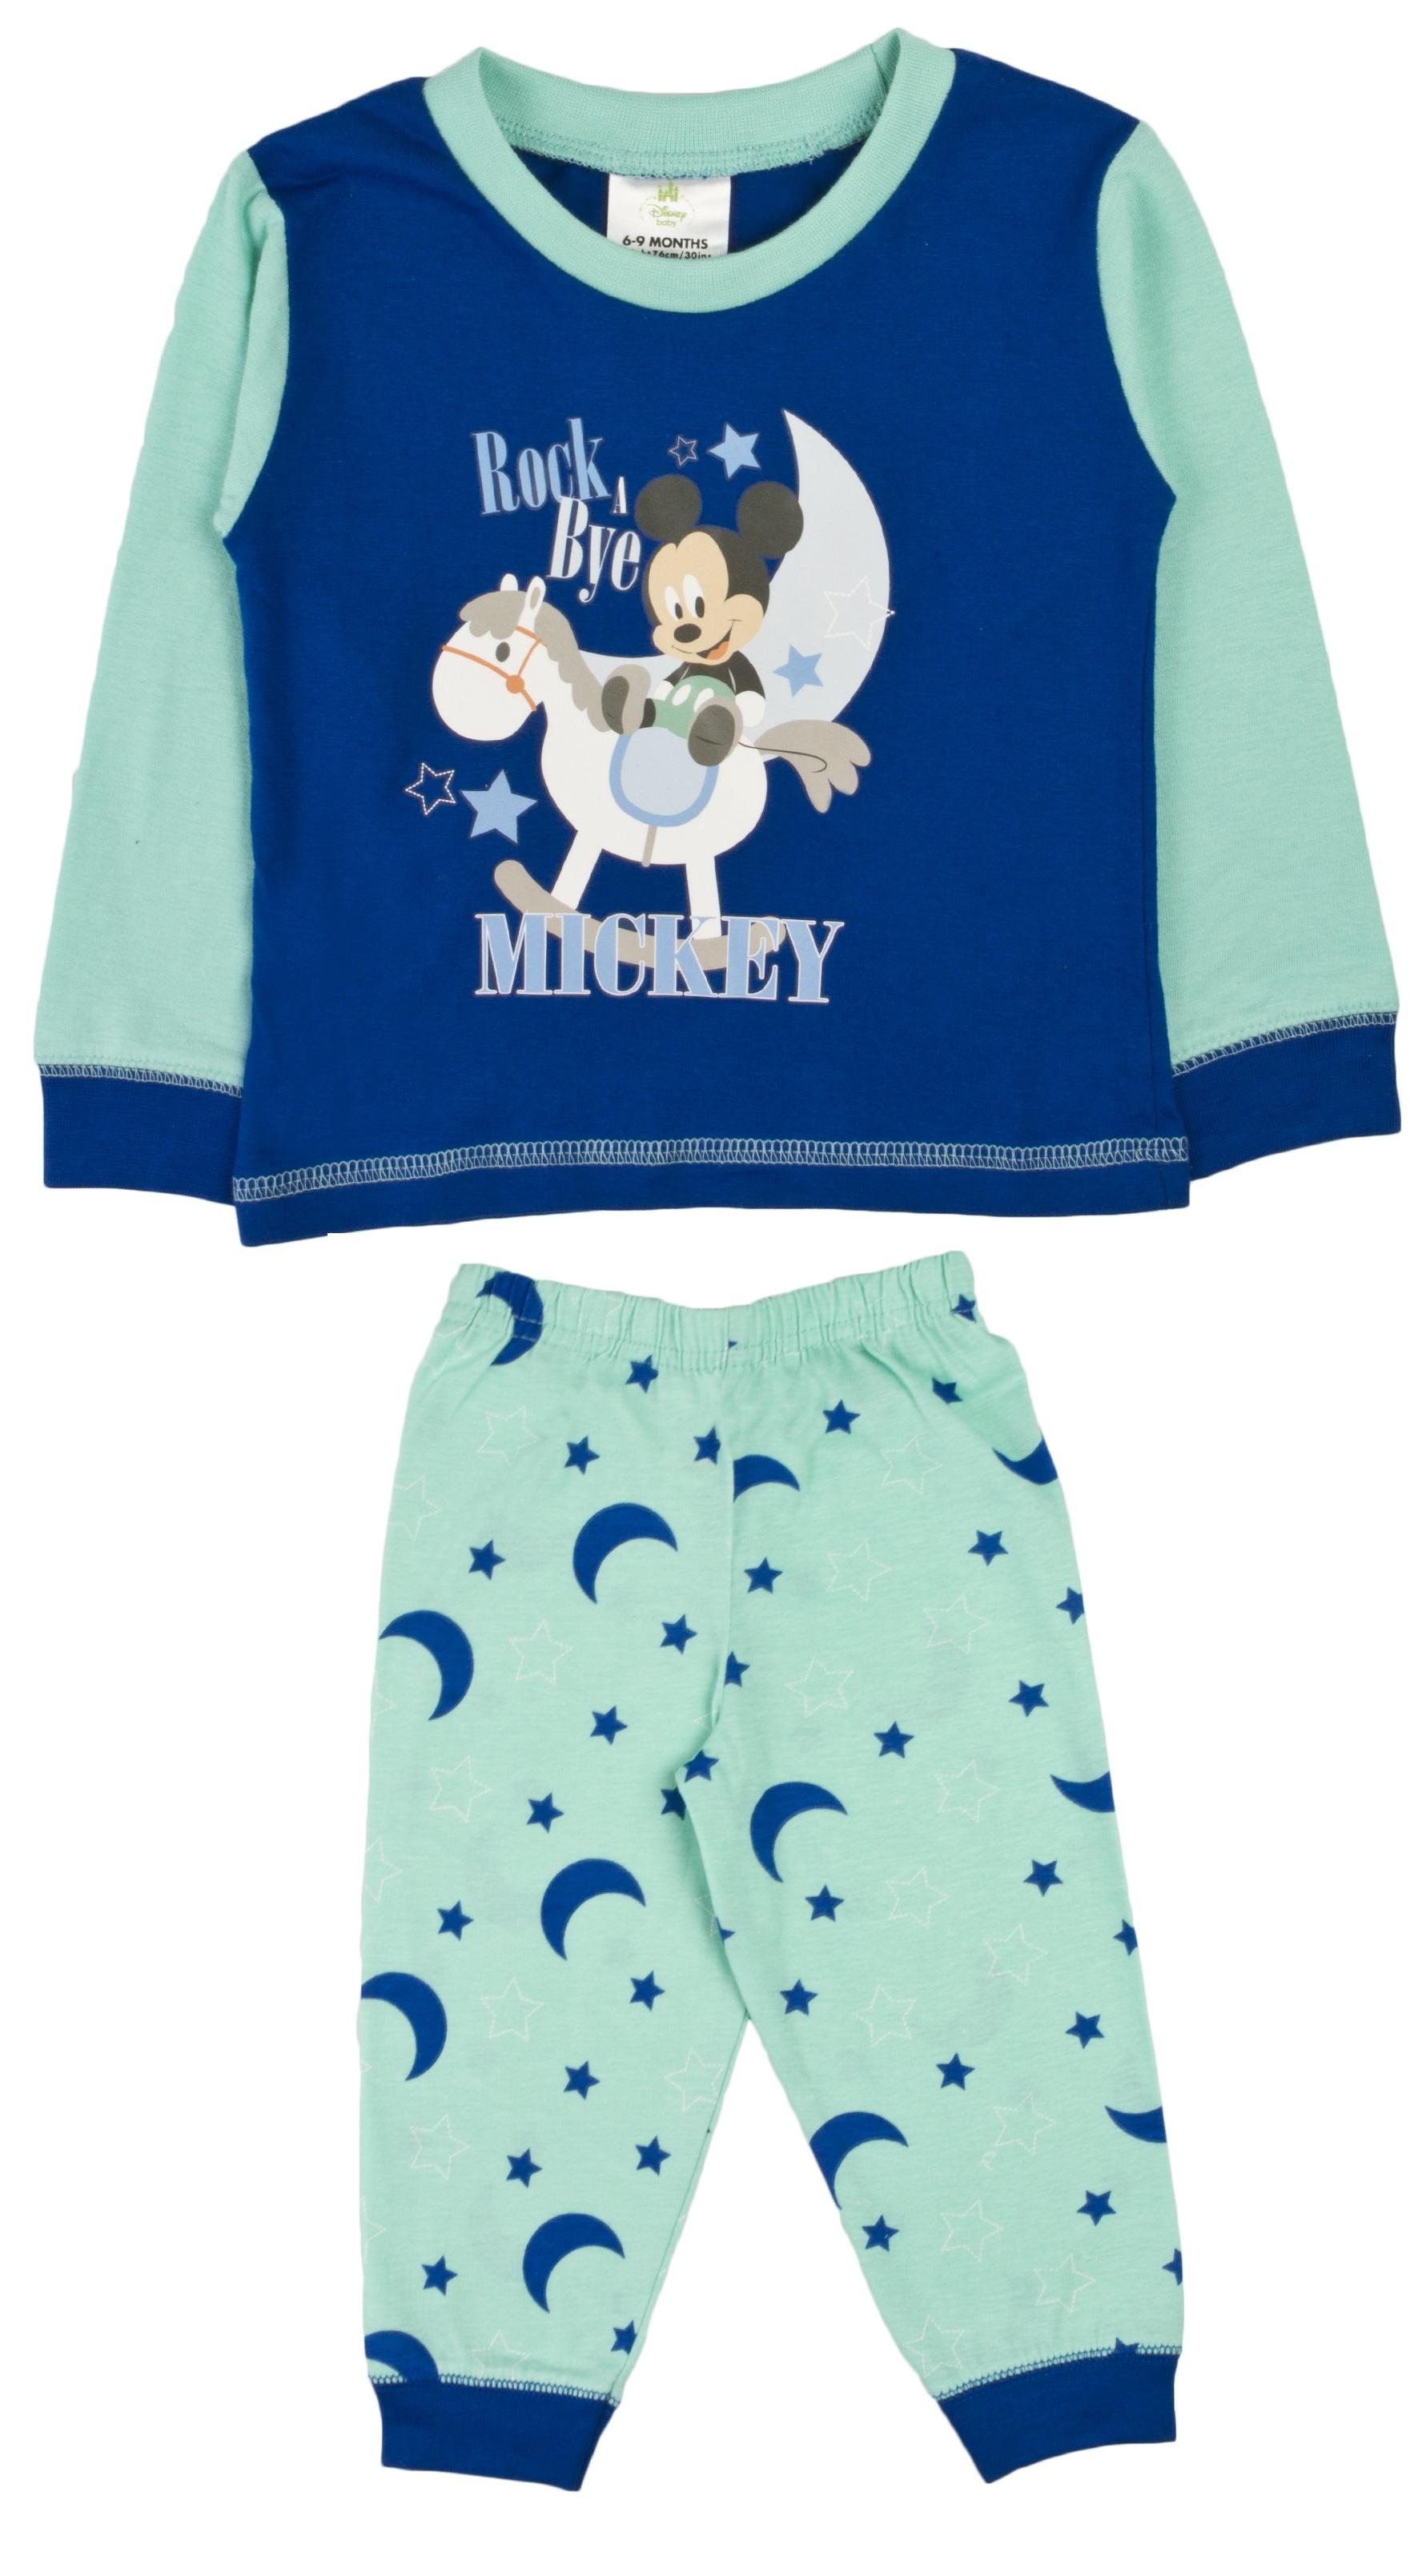 FREE SHIPPING AVAILABLE! Shop shopnow-ahoqsxpv.ga and save on Disney Pajamas.